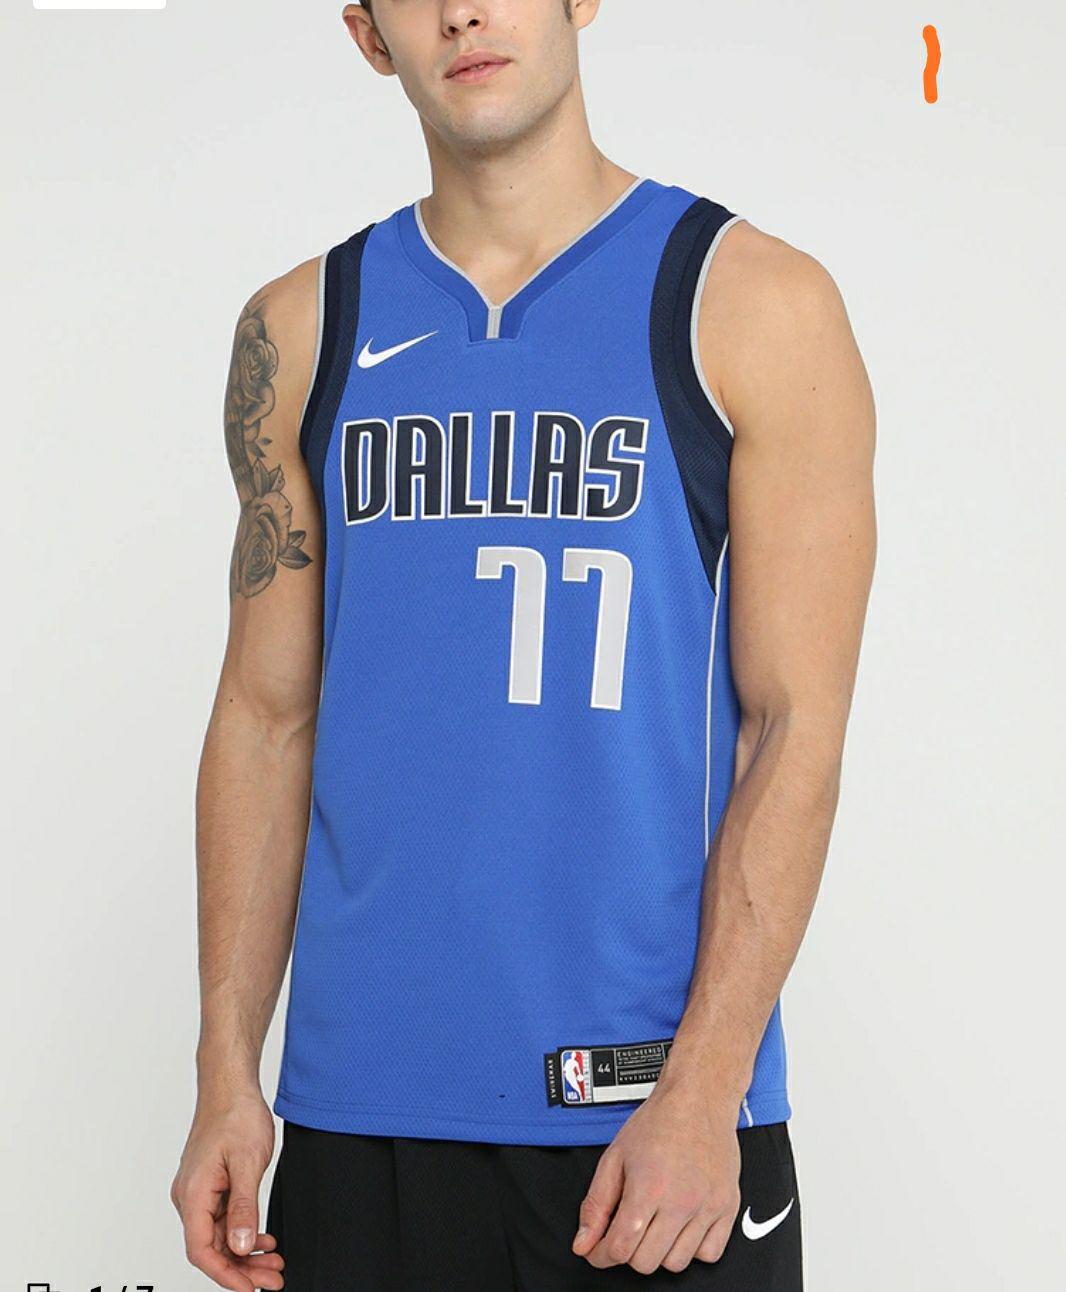 Camiseta Nike NBA Luka Doncic. Todas las tallas menos L.